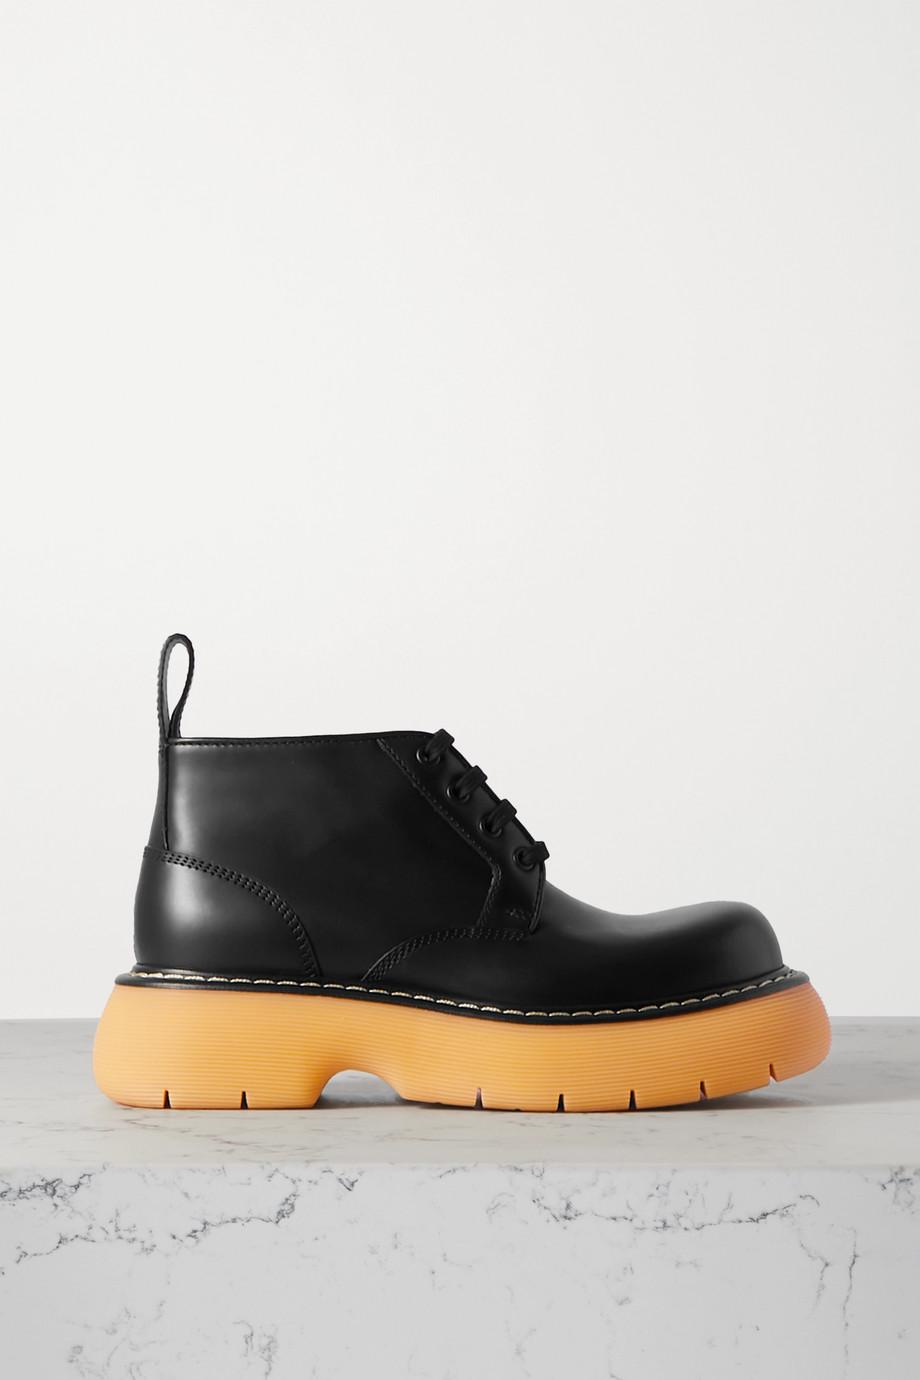 Bottega Veneta The Bounce leather ankle boots